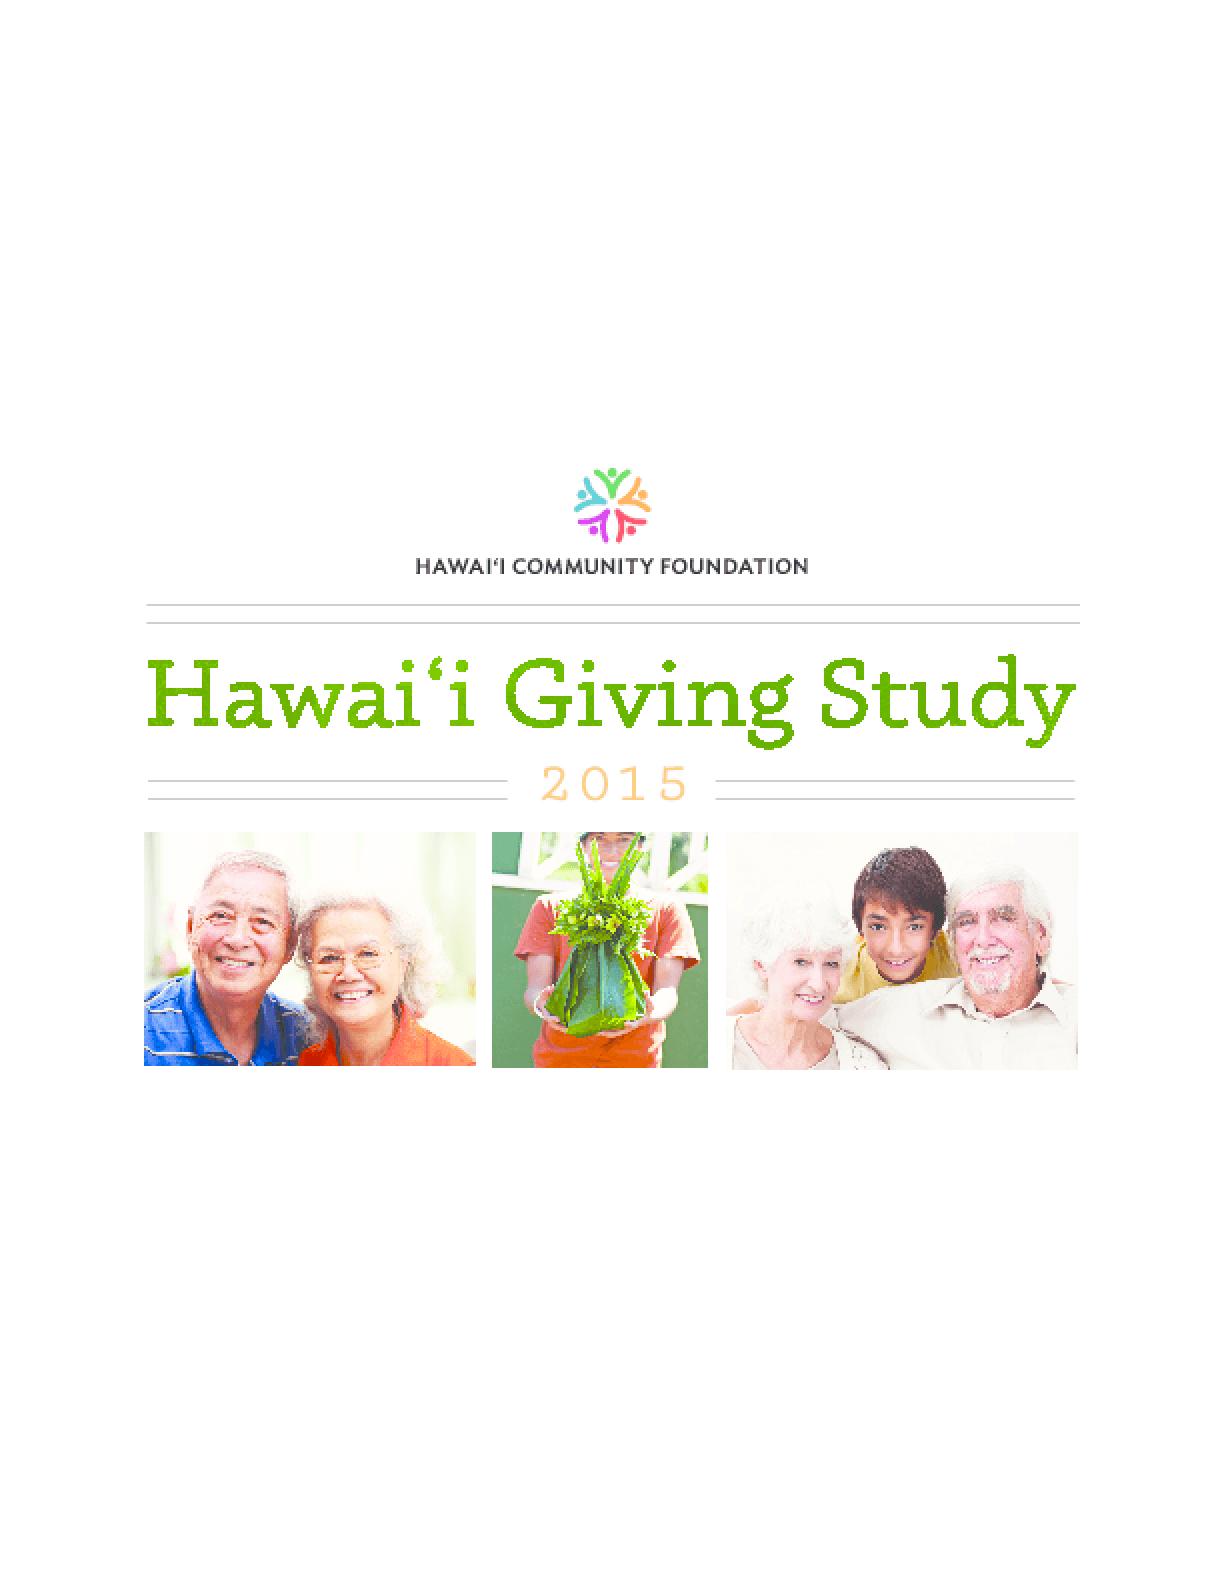 The Hawai'i Giving Study 2015